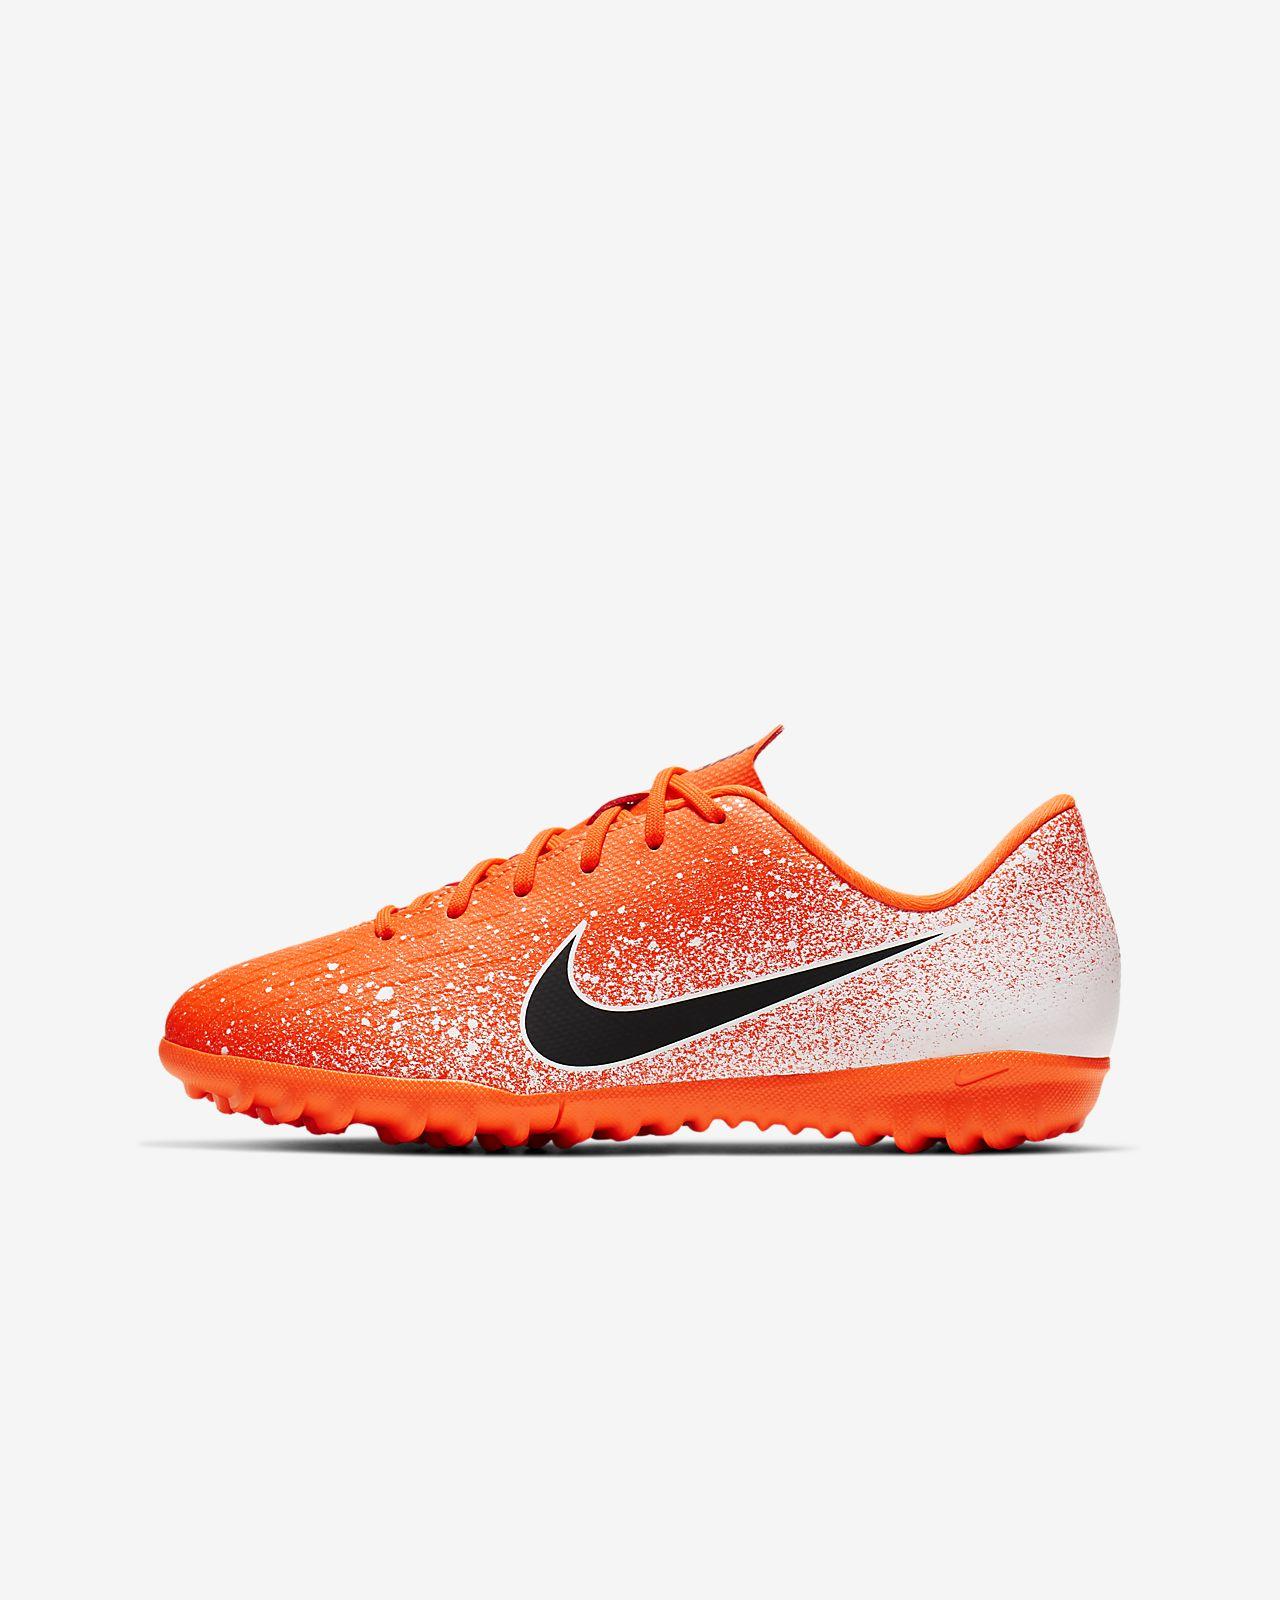 Nike Jr. Vapor 12 Academy TF Fußballschuh für Turf für jüngere/ältere Kinder